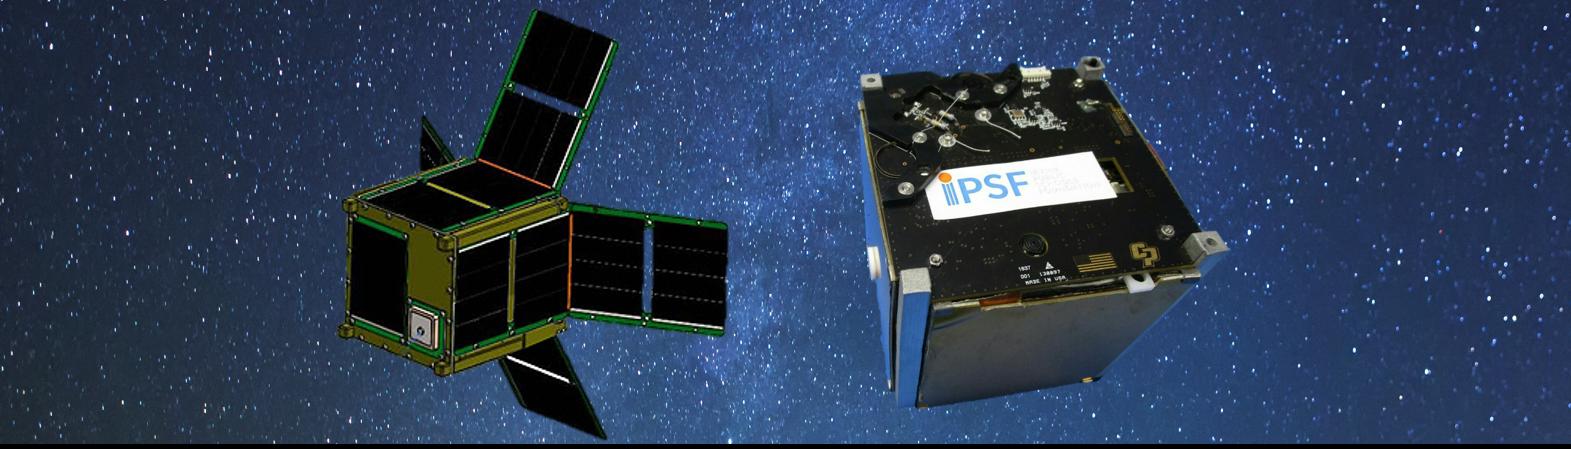 NASA Mission Supports Launch of CubeSats Built by Students | NASA